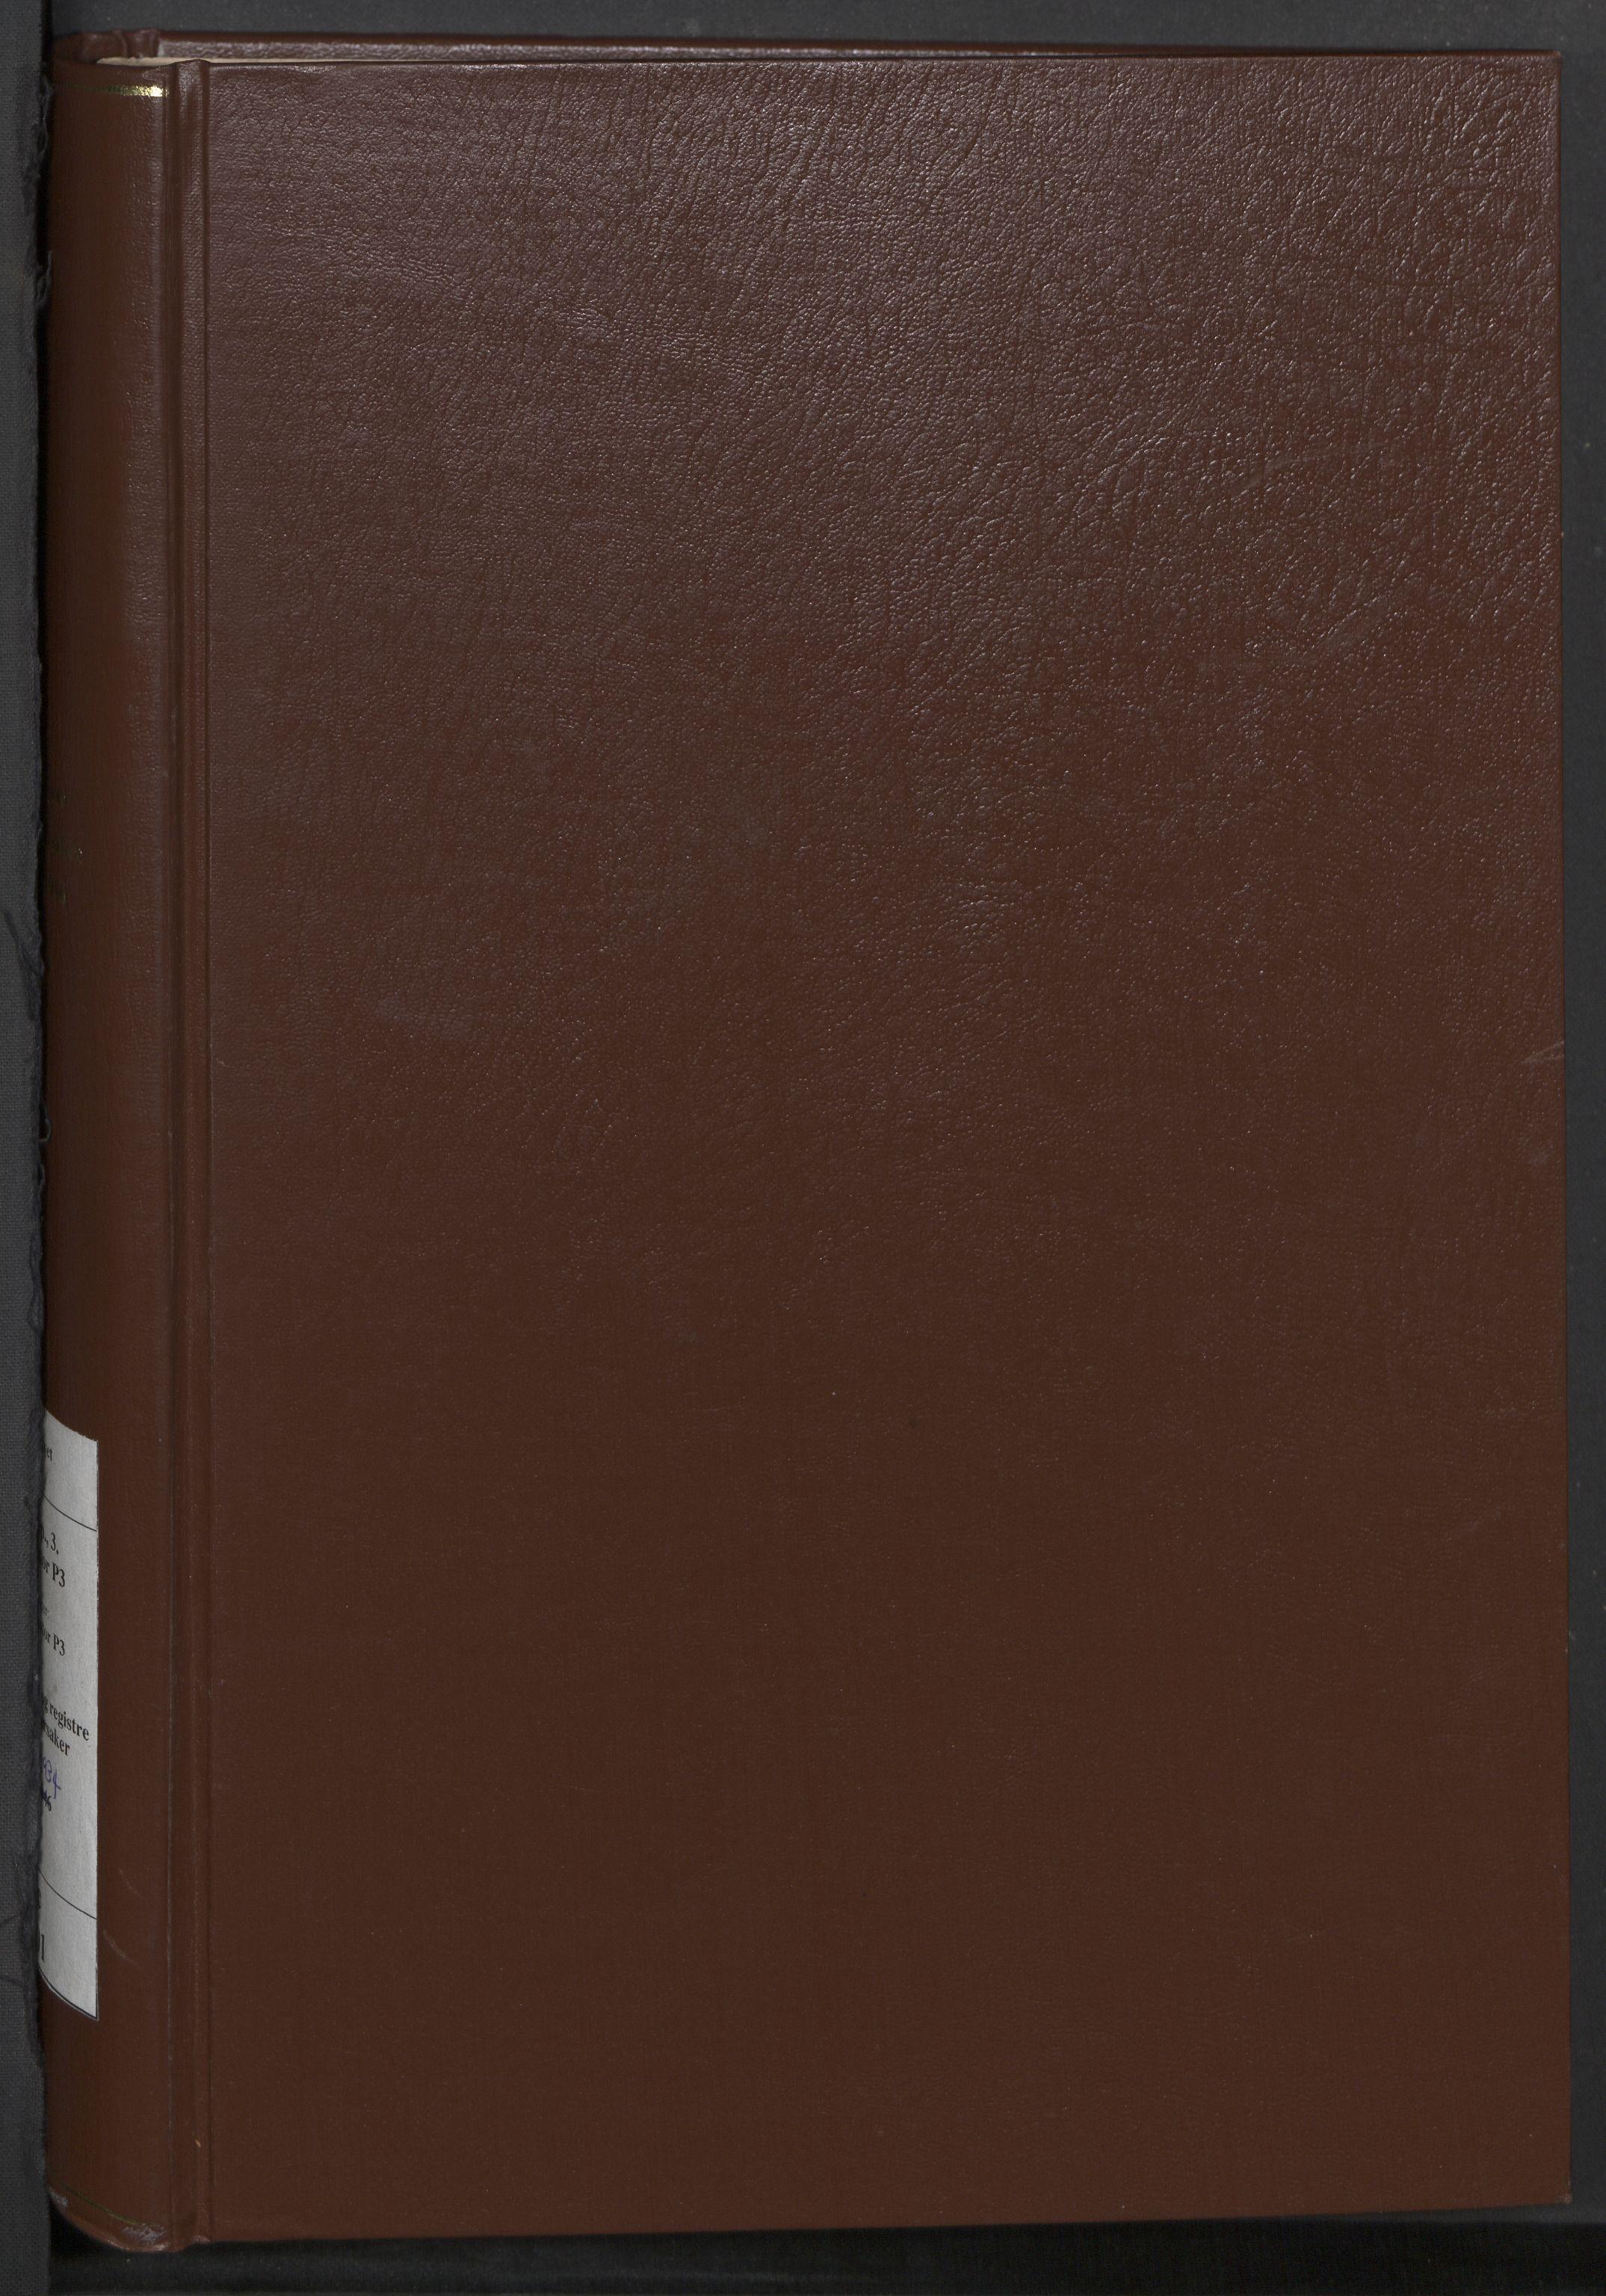 RA, Justisdepartementet, 3. politikontor P3, C/Cc/L0001: Journal over statsborgersaker, 1891-1946